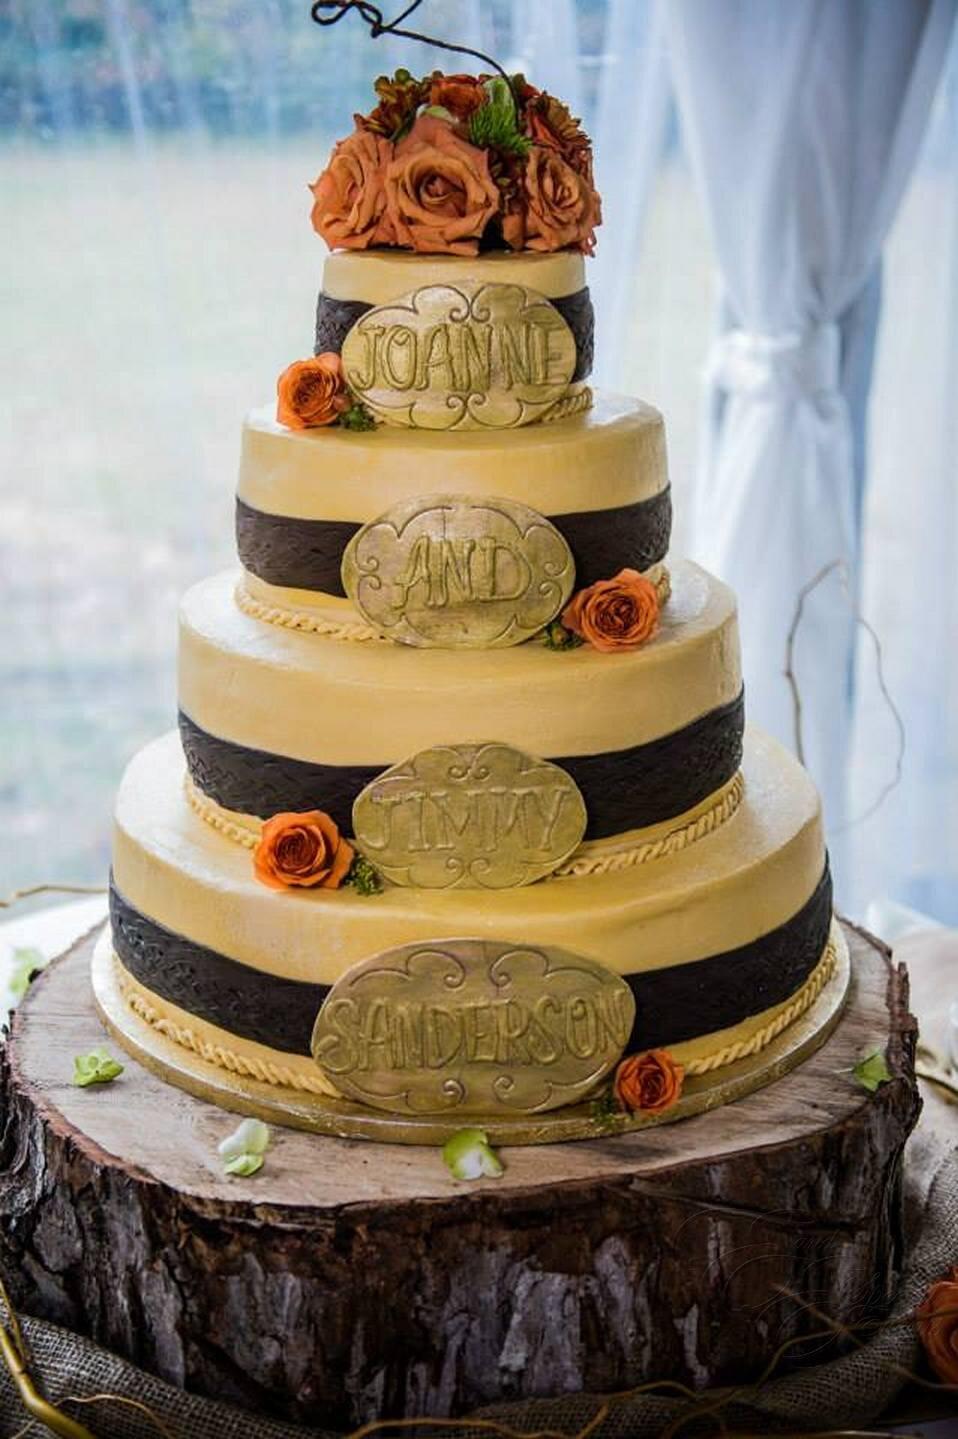 Cowboy theme wedding cake.jpg